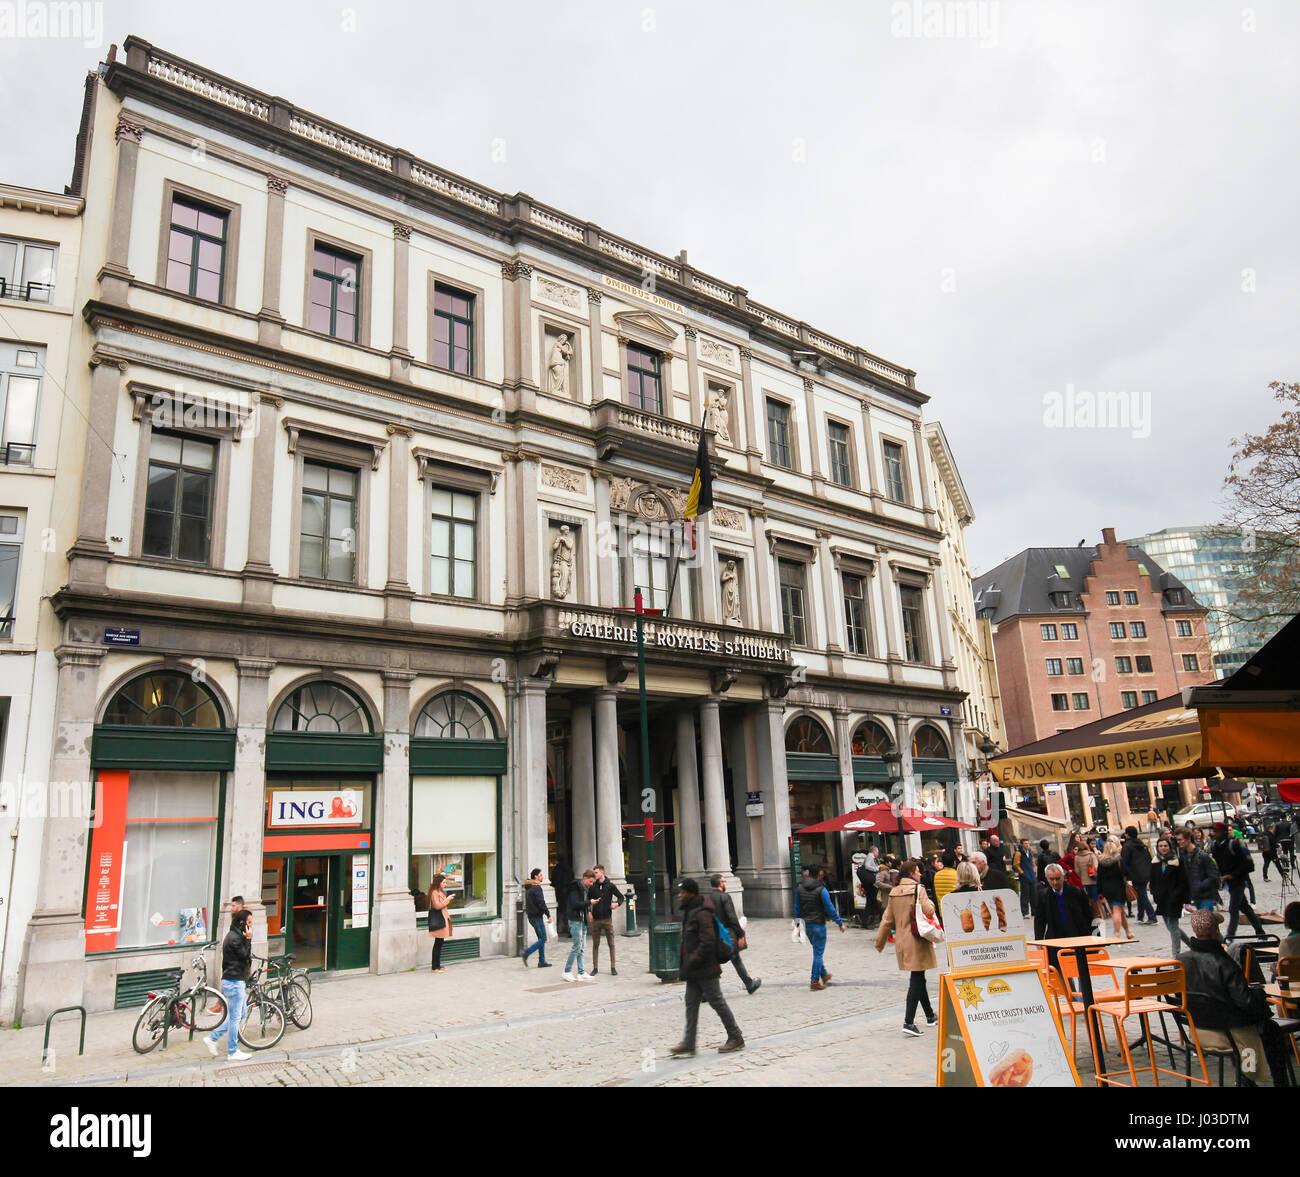 The Galeries Royales Saint-Hubert (French) or Koninklijke Sint-Hubertusgalerijen (Dutch) is a glazed shopping arcade - Stock Image